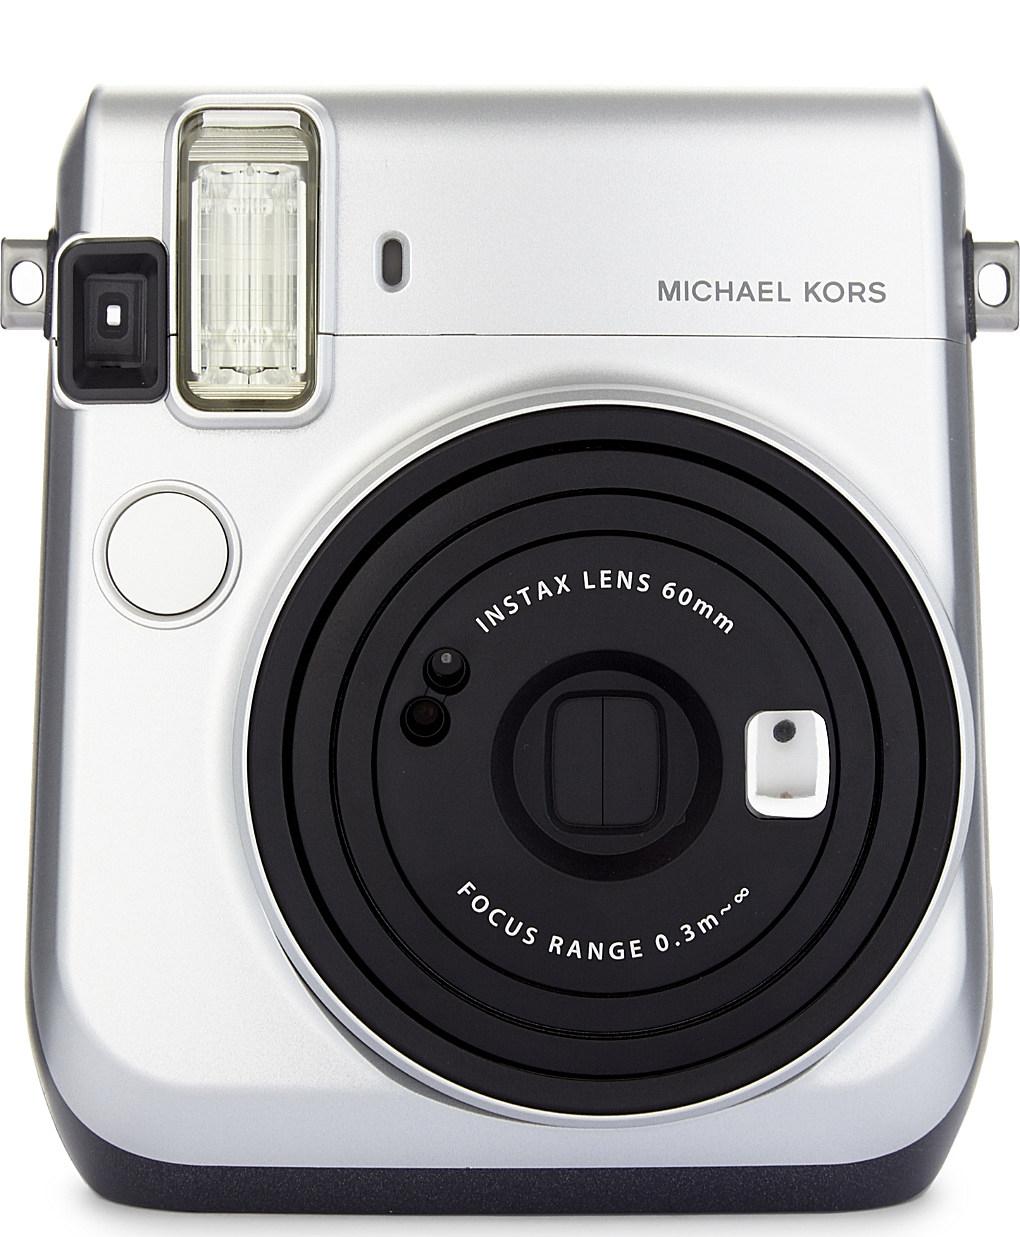 Michael Kors Camera - Michael Michael Kors Instax Mini 70 Instant CameraAvailable at Selfridges, £120.00